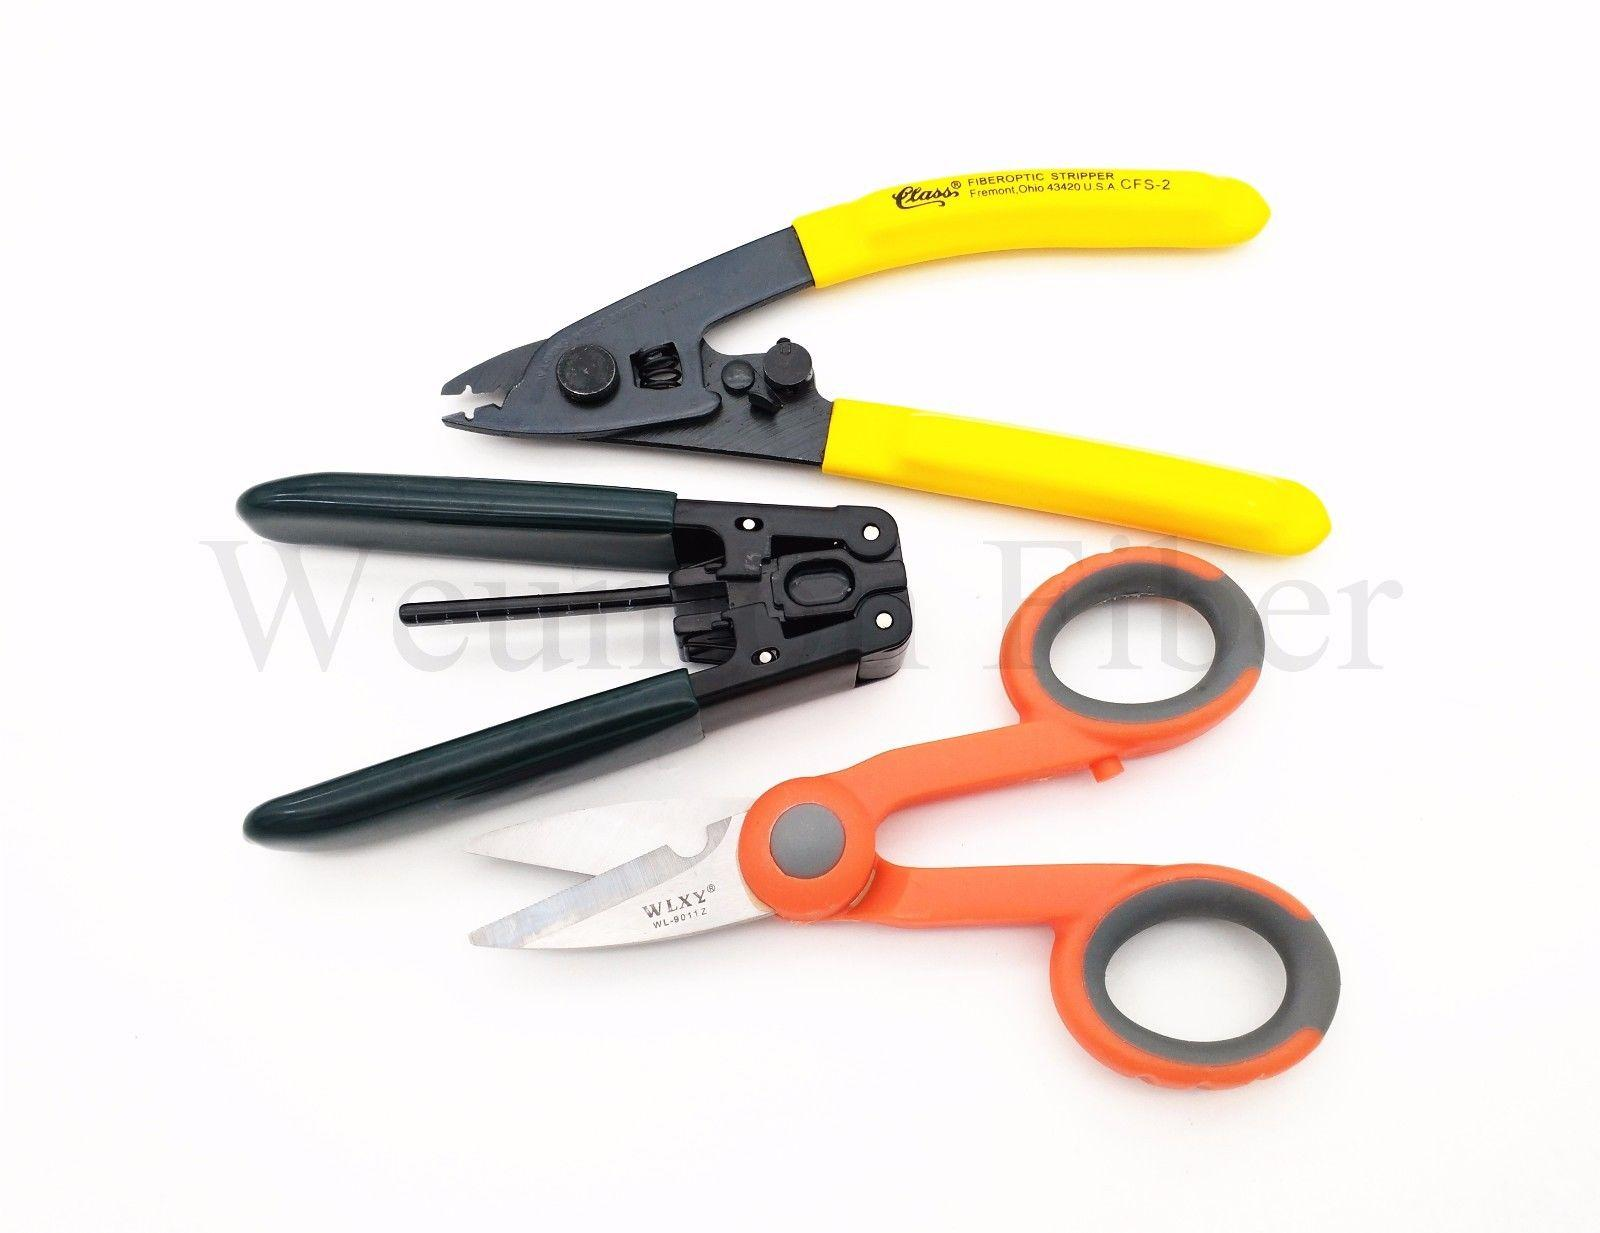 Fiber Optic Stripping Tool FTTH Drop Cable Stripper CFS-2 Fiber Cutter FTTH Tool